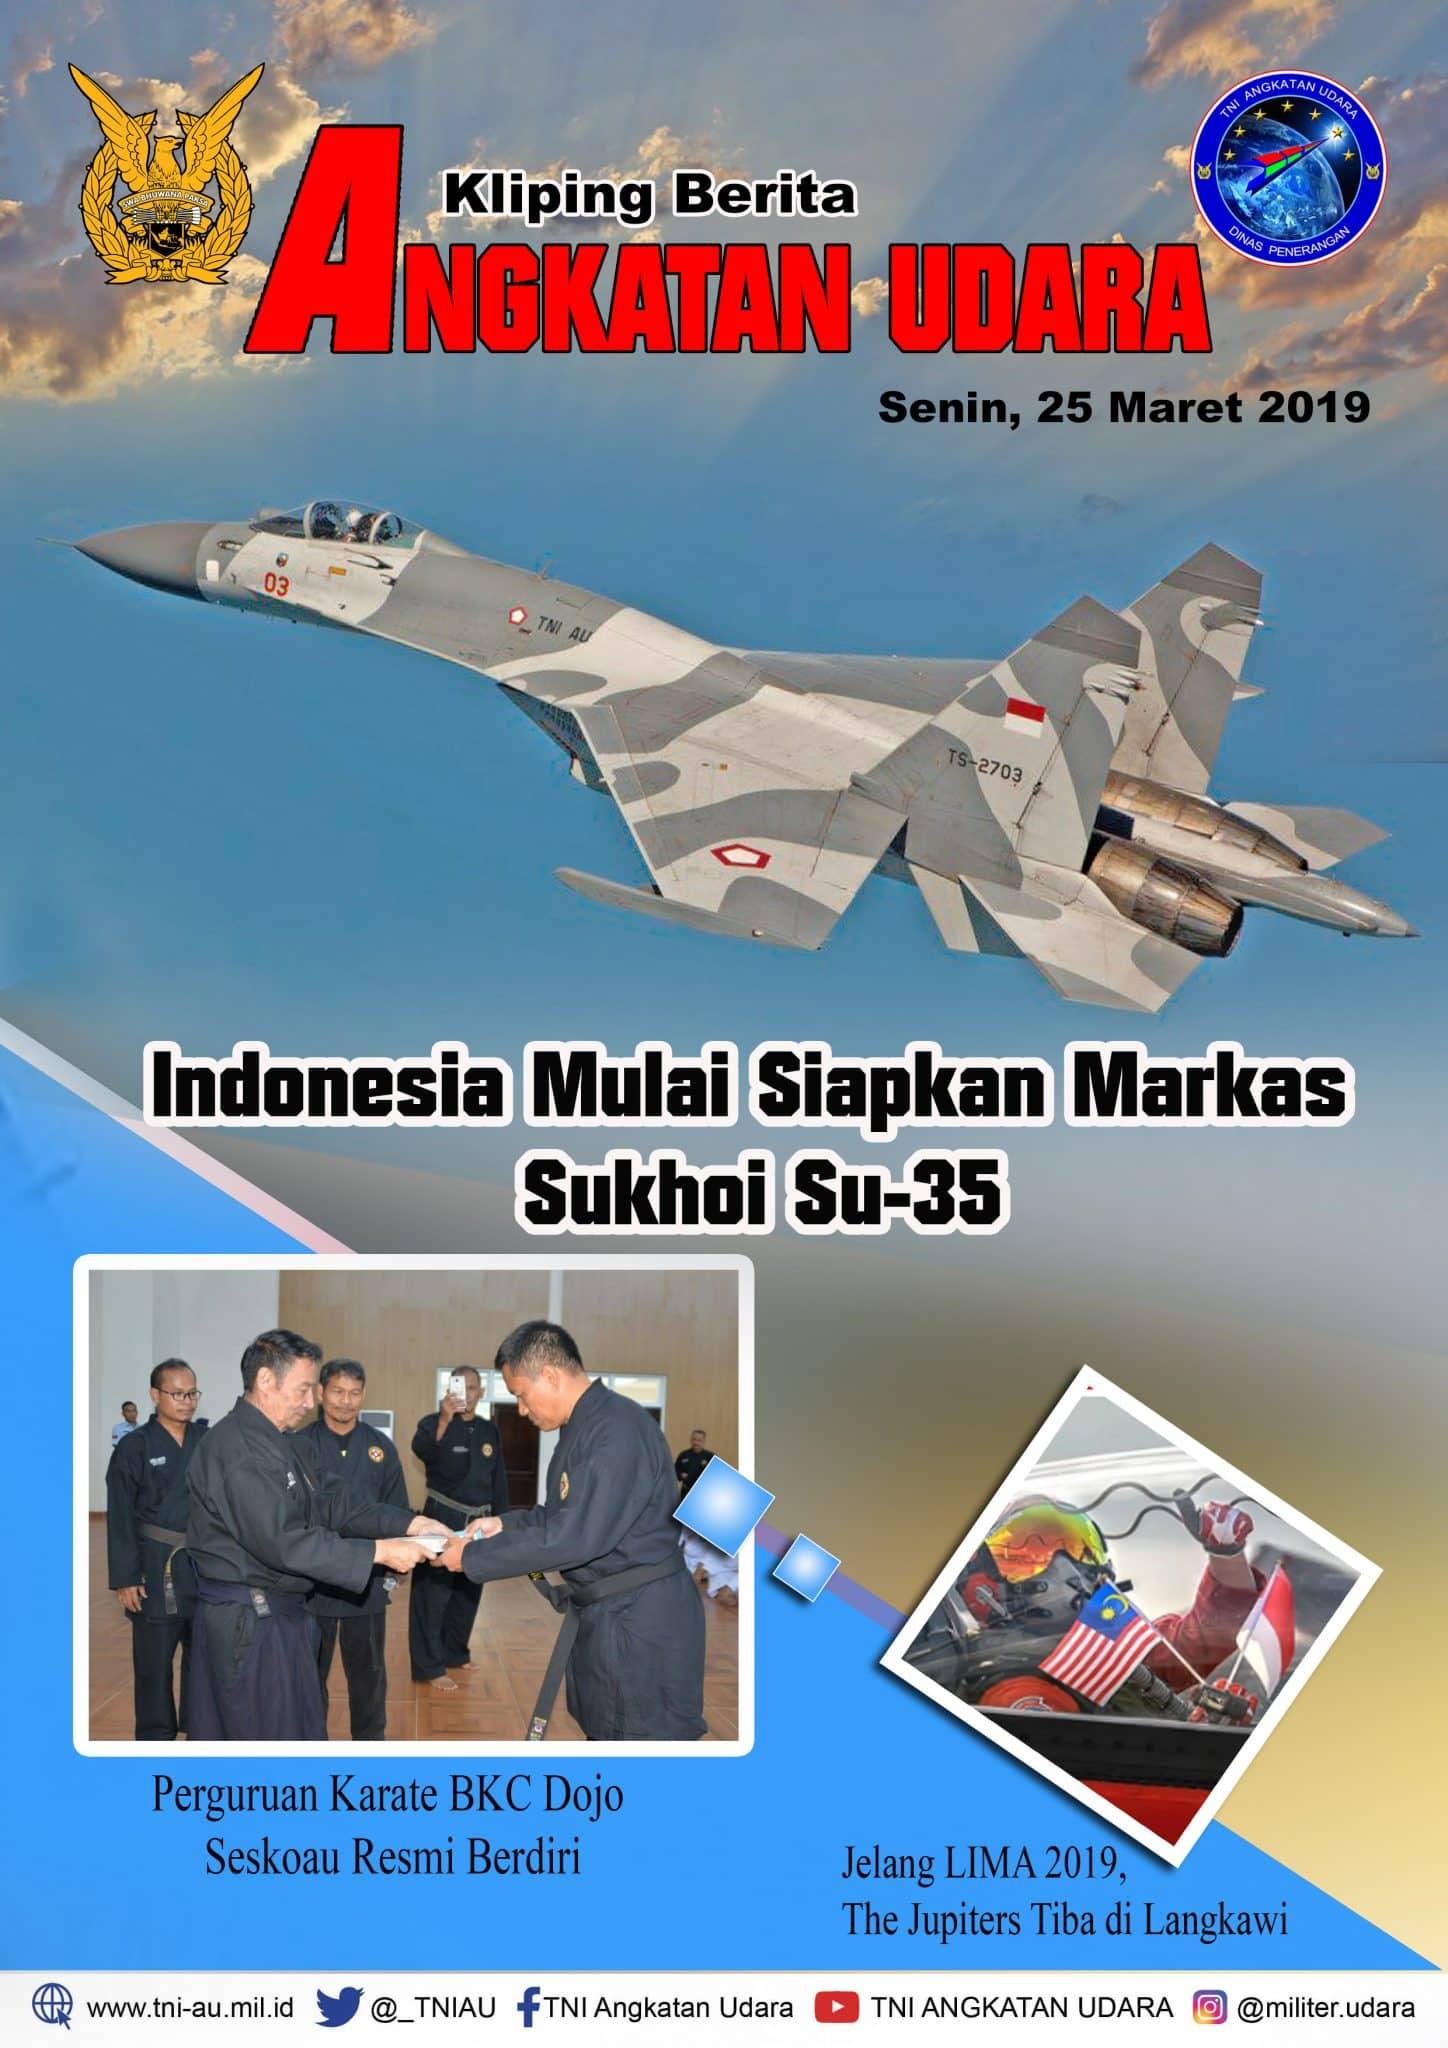 Kliping Berita Media 25 Maret 2019